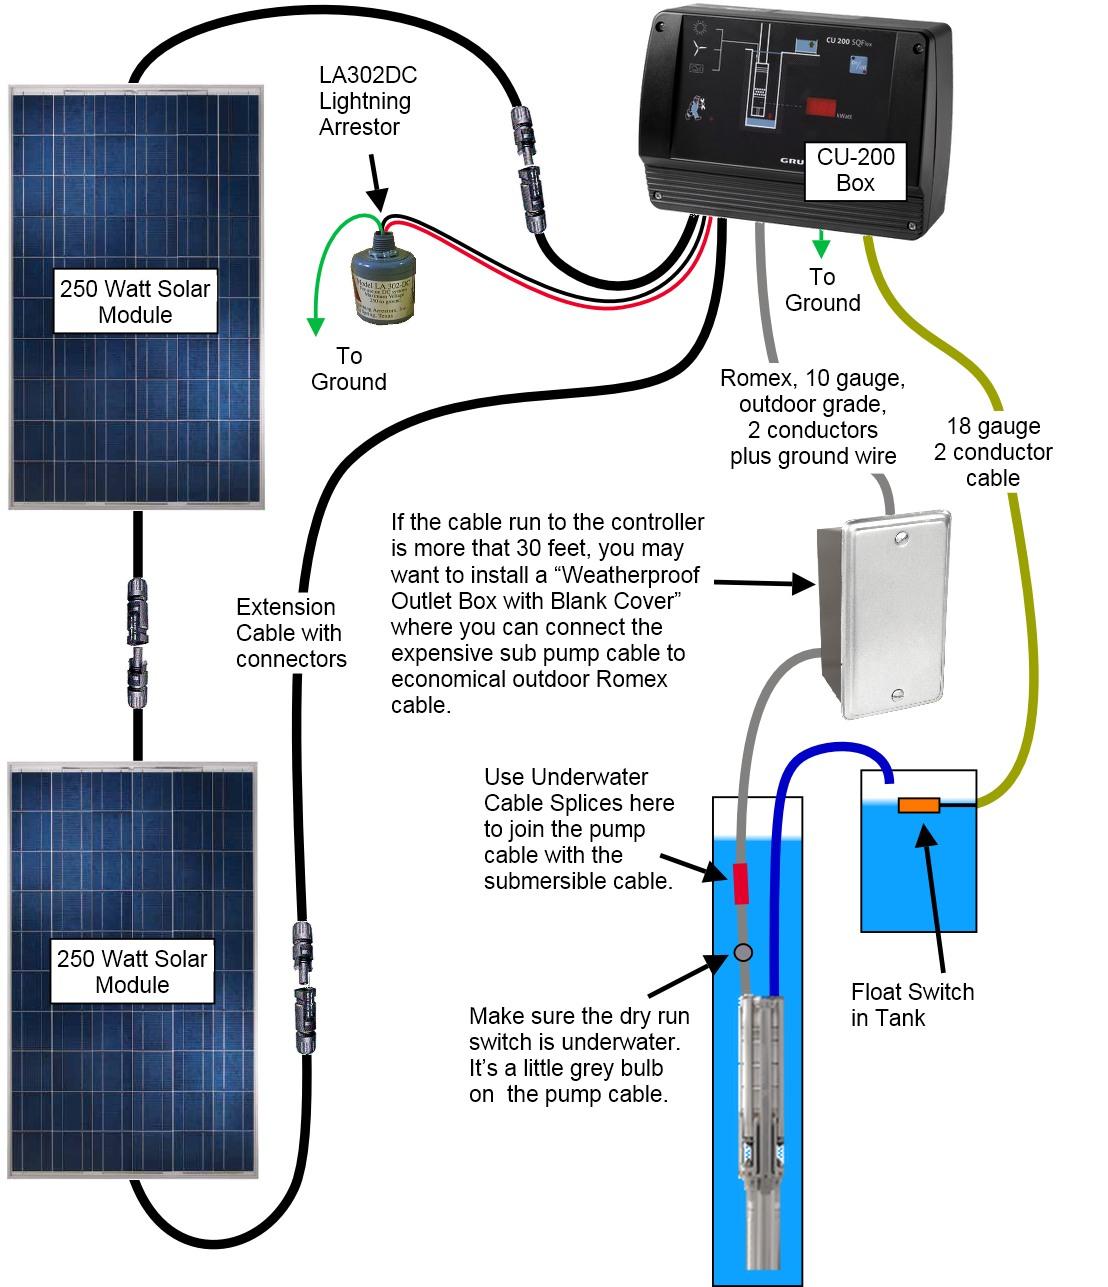 grundfos sqflex installation diagram?resize\=665%2C772 wiring diagrams for caravan solar system wiring diagrams caravan solar system wiring diagram at edmiracle.co